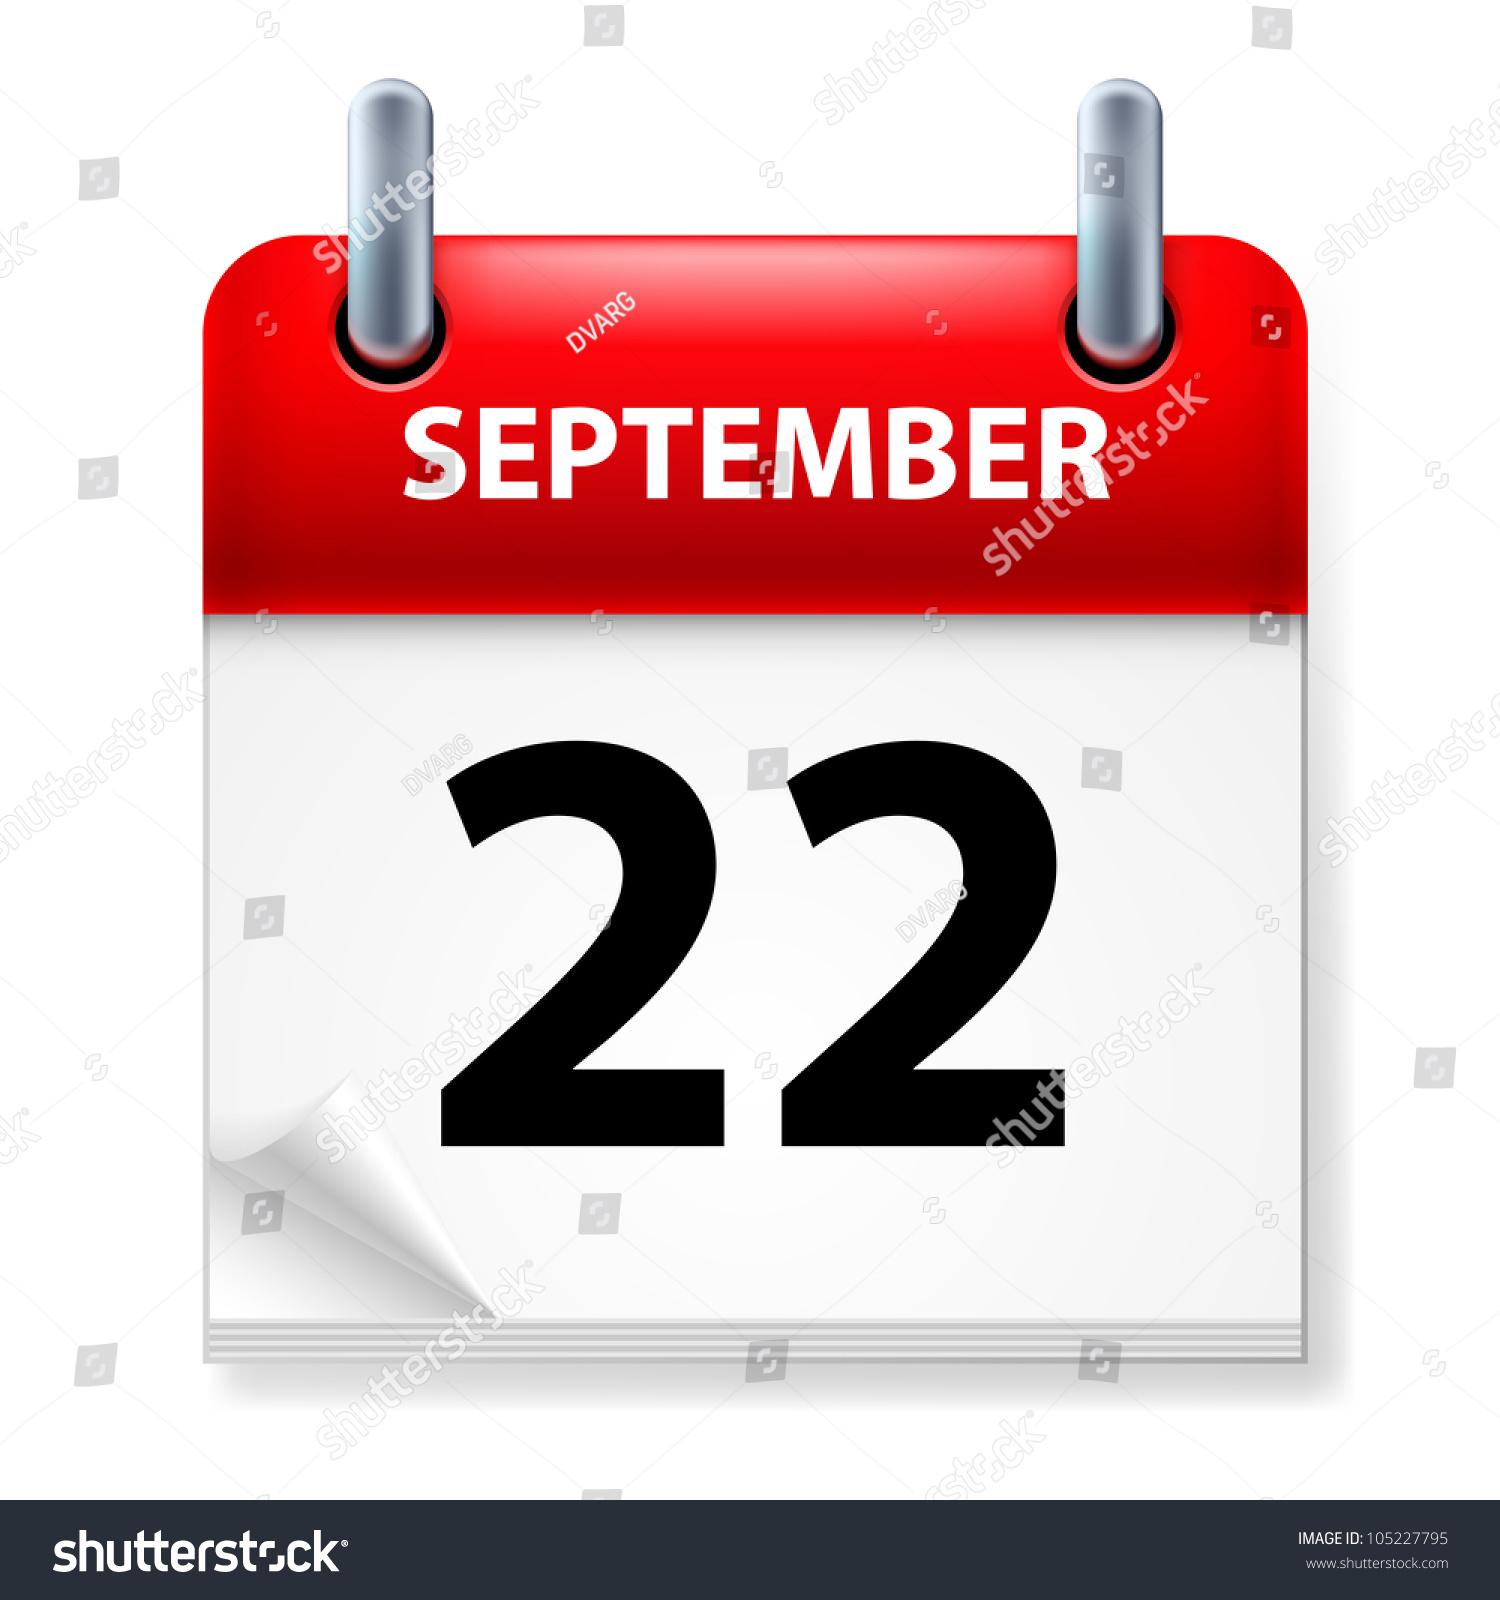 Calendar Background Vector : Twentysecond september calendar icon on white stock vector